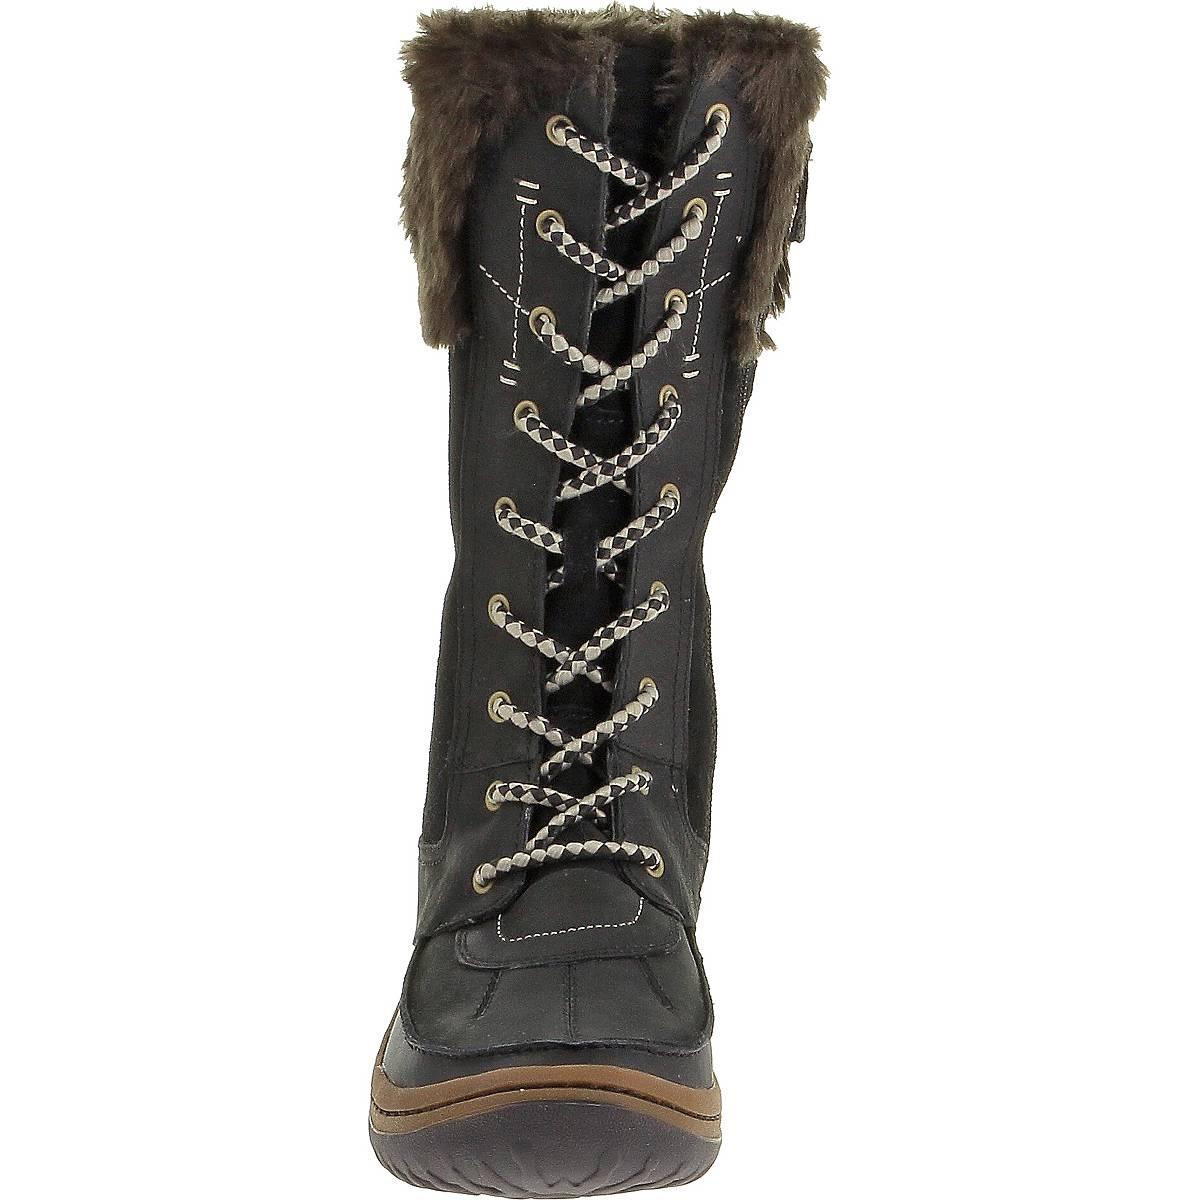 c0dc7267f9bb65 ... Image of Merrell Decora Prelude Waterproof Boots (Women s) - Black ...